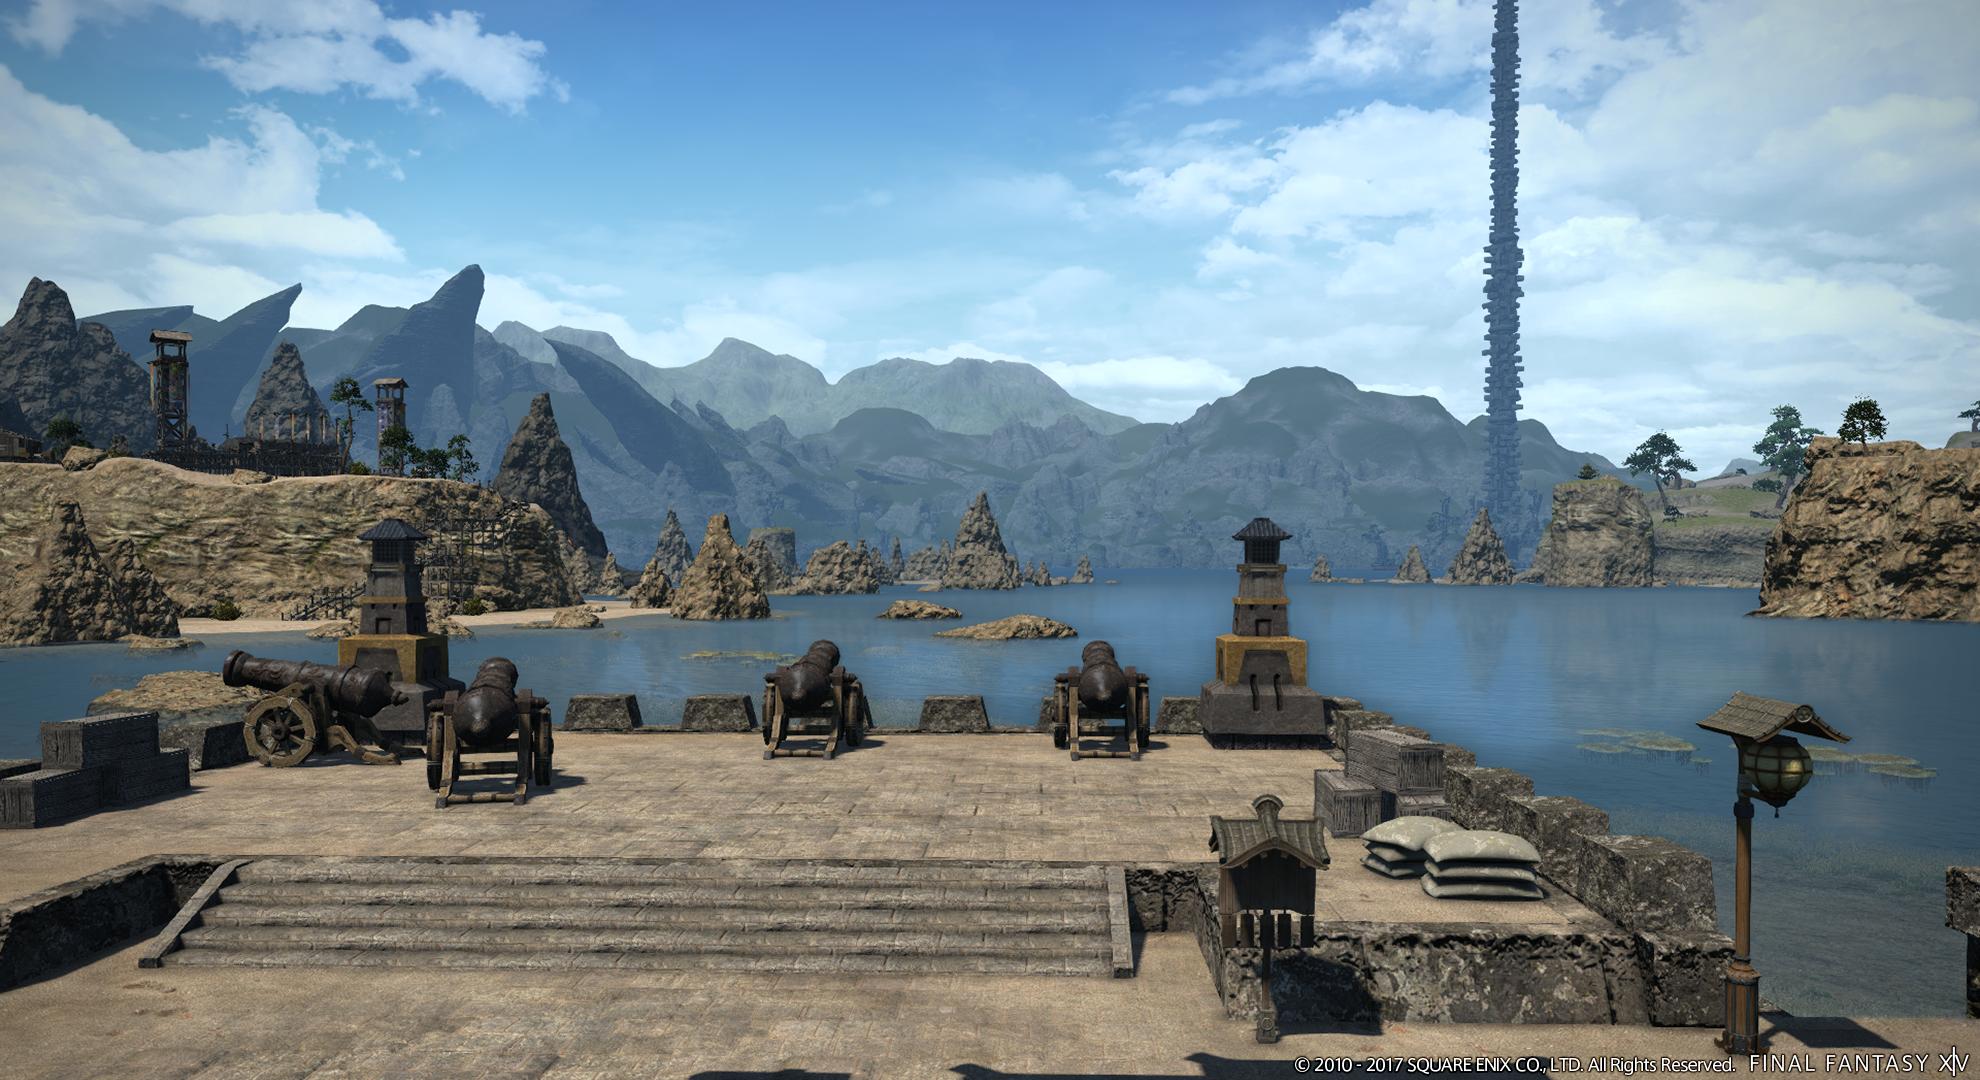 Final Fantasy XIV: Stormblood Image 11